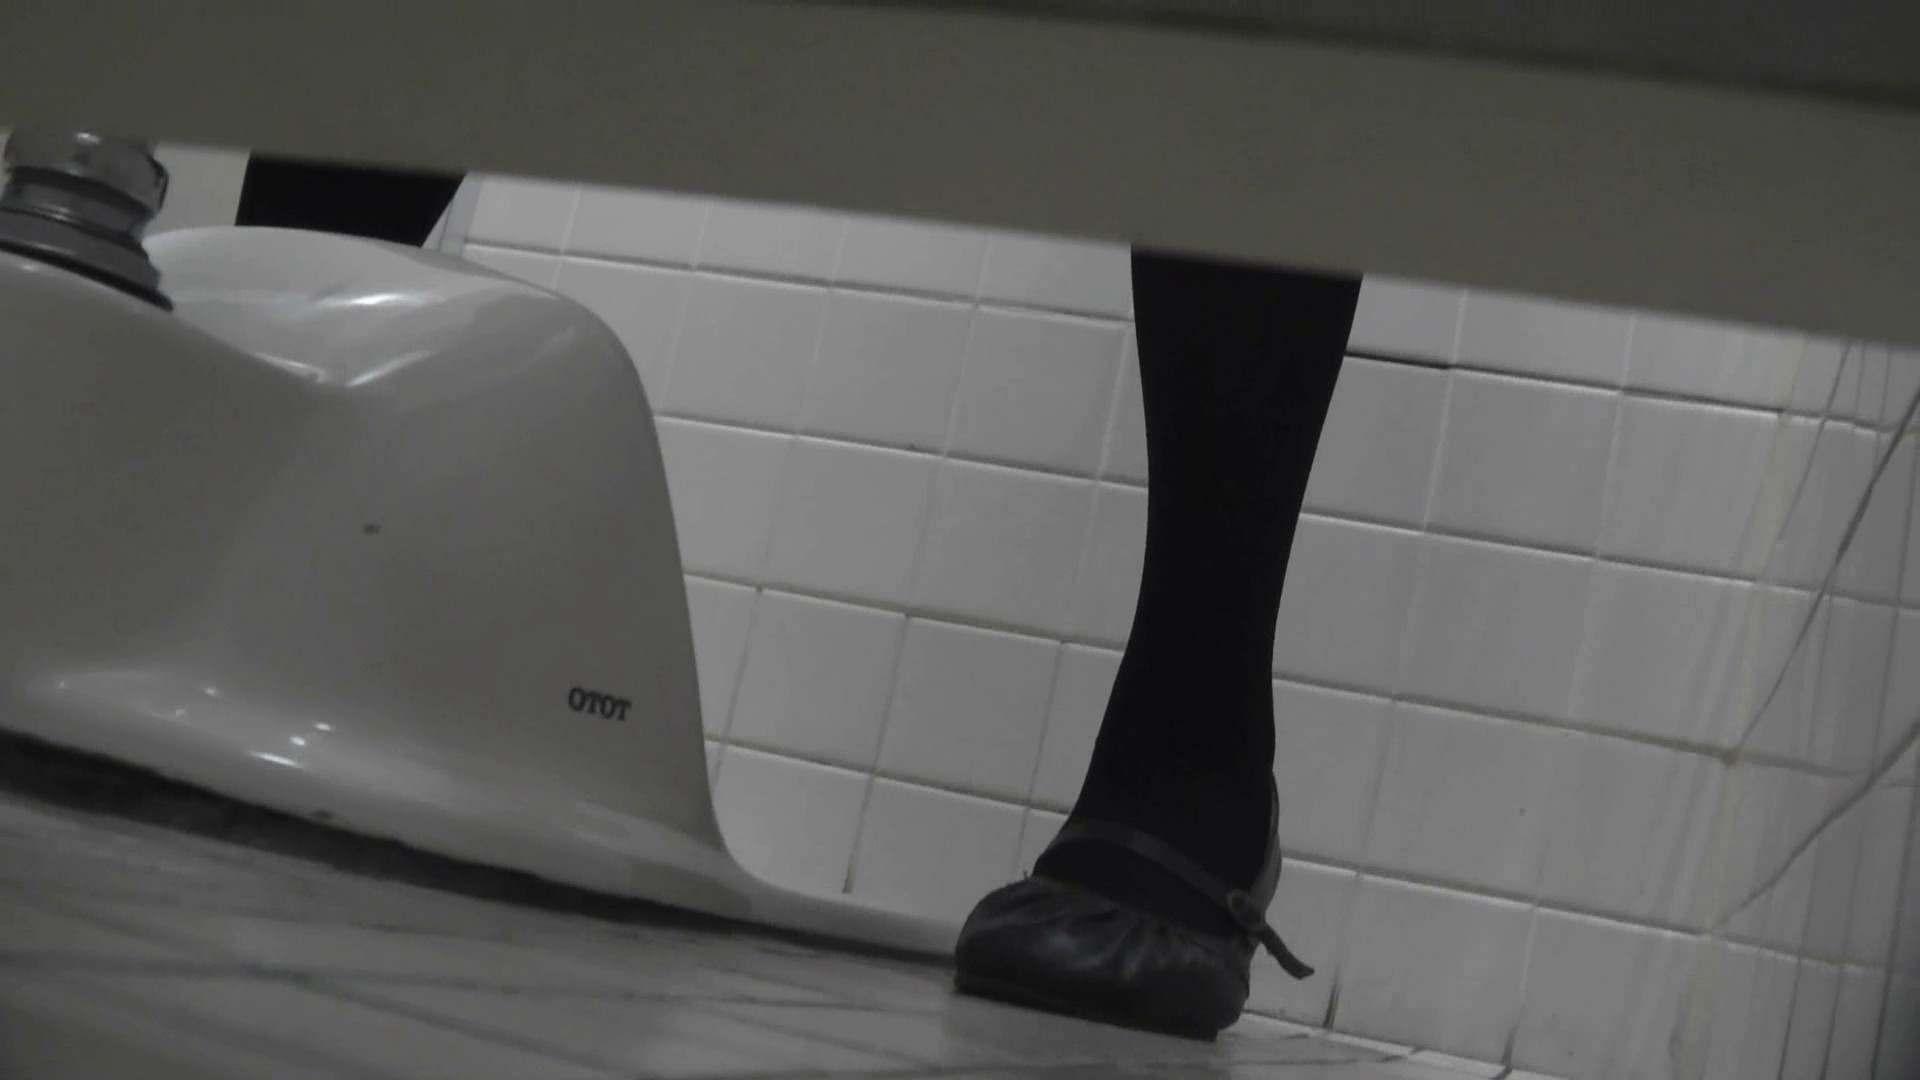 vol.25三十時間潜り、一つしか出会えない完璧桃尻編 byお銀 洗面所 のぞき動画キャプチャ 96連発 75